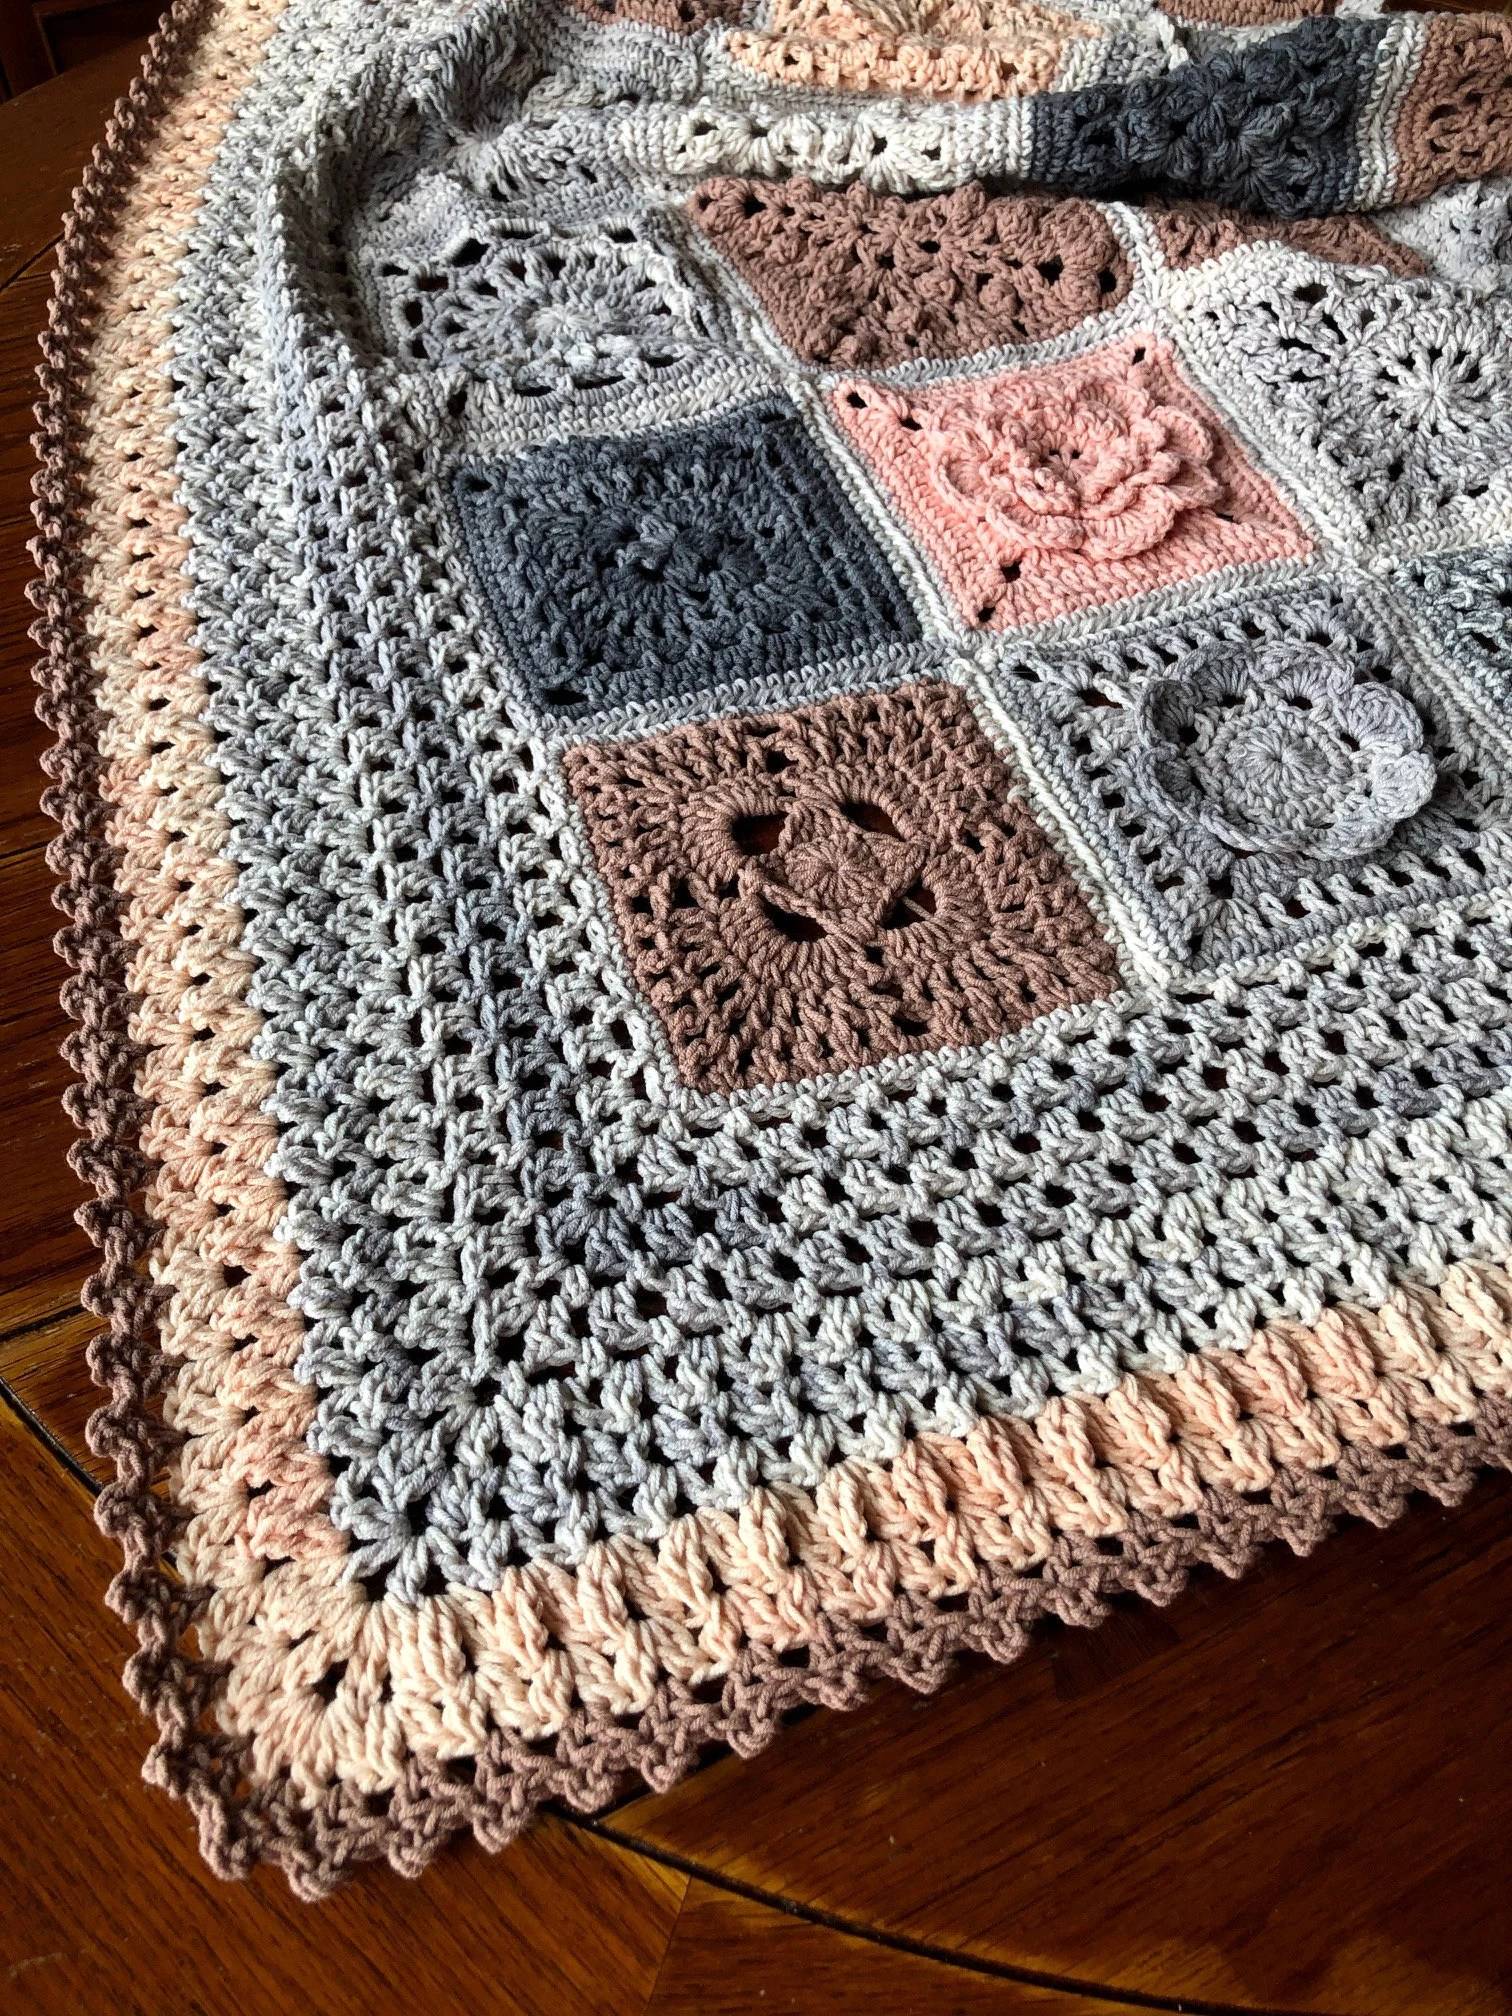 Wedding Afghan Crochet Pattern : wedding, afghan, crochet, pattern, CROCHET, BLANKET, Patterns/crochet, Blanket/wedding, Gift/crochet, Blanket/, Crochet, Granny, Square/easy, Pattern/easy, Blanket, Pattern